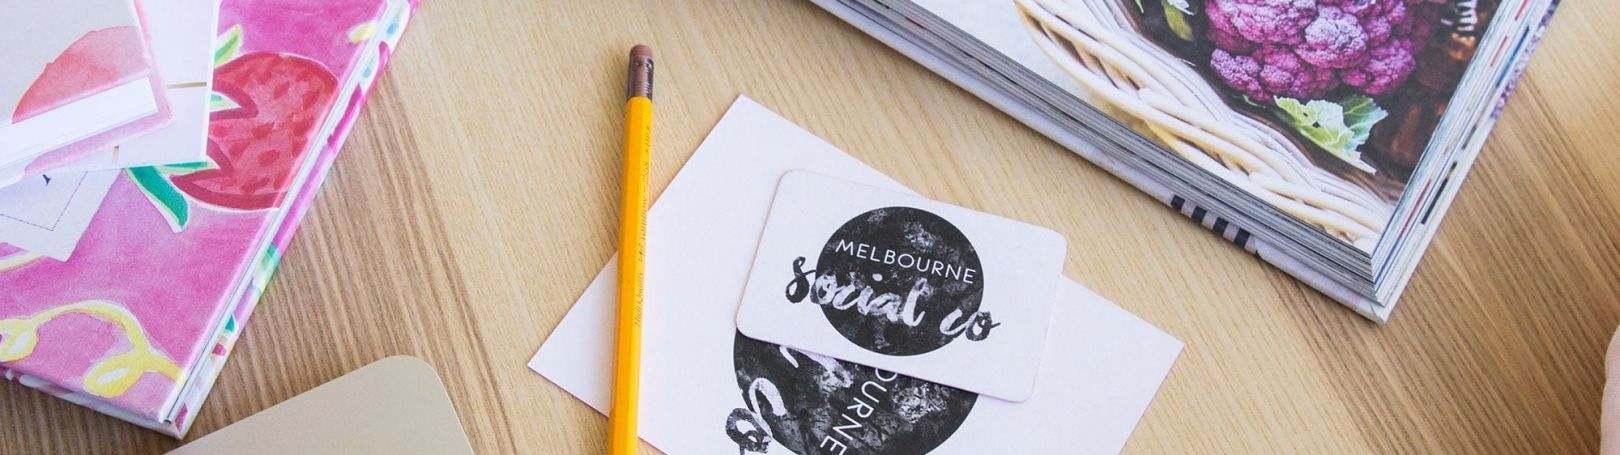 Melbourne Social Co